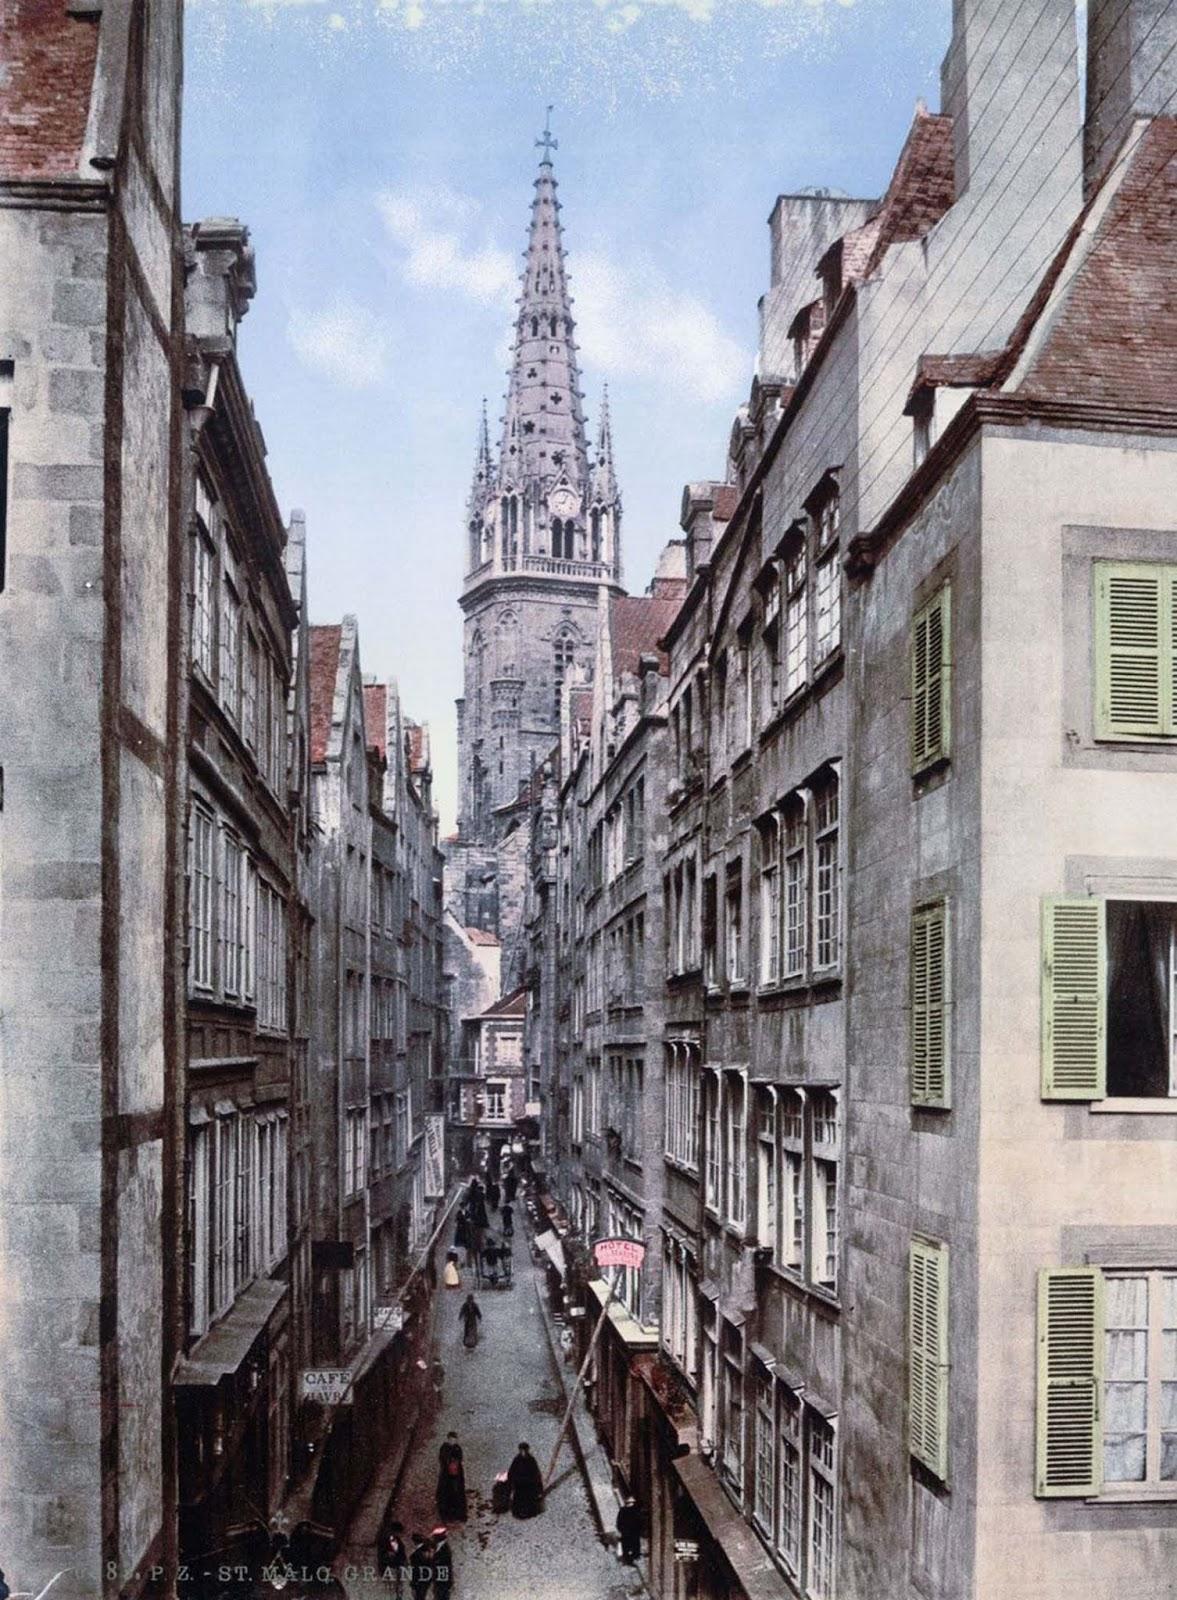 Grand Street, St. Malo.